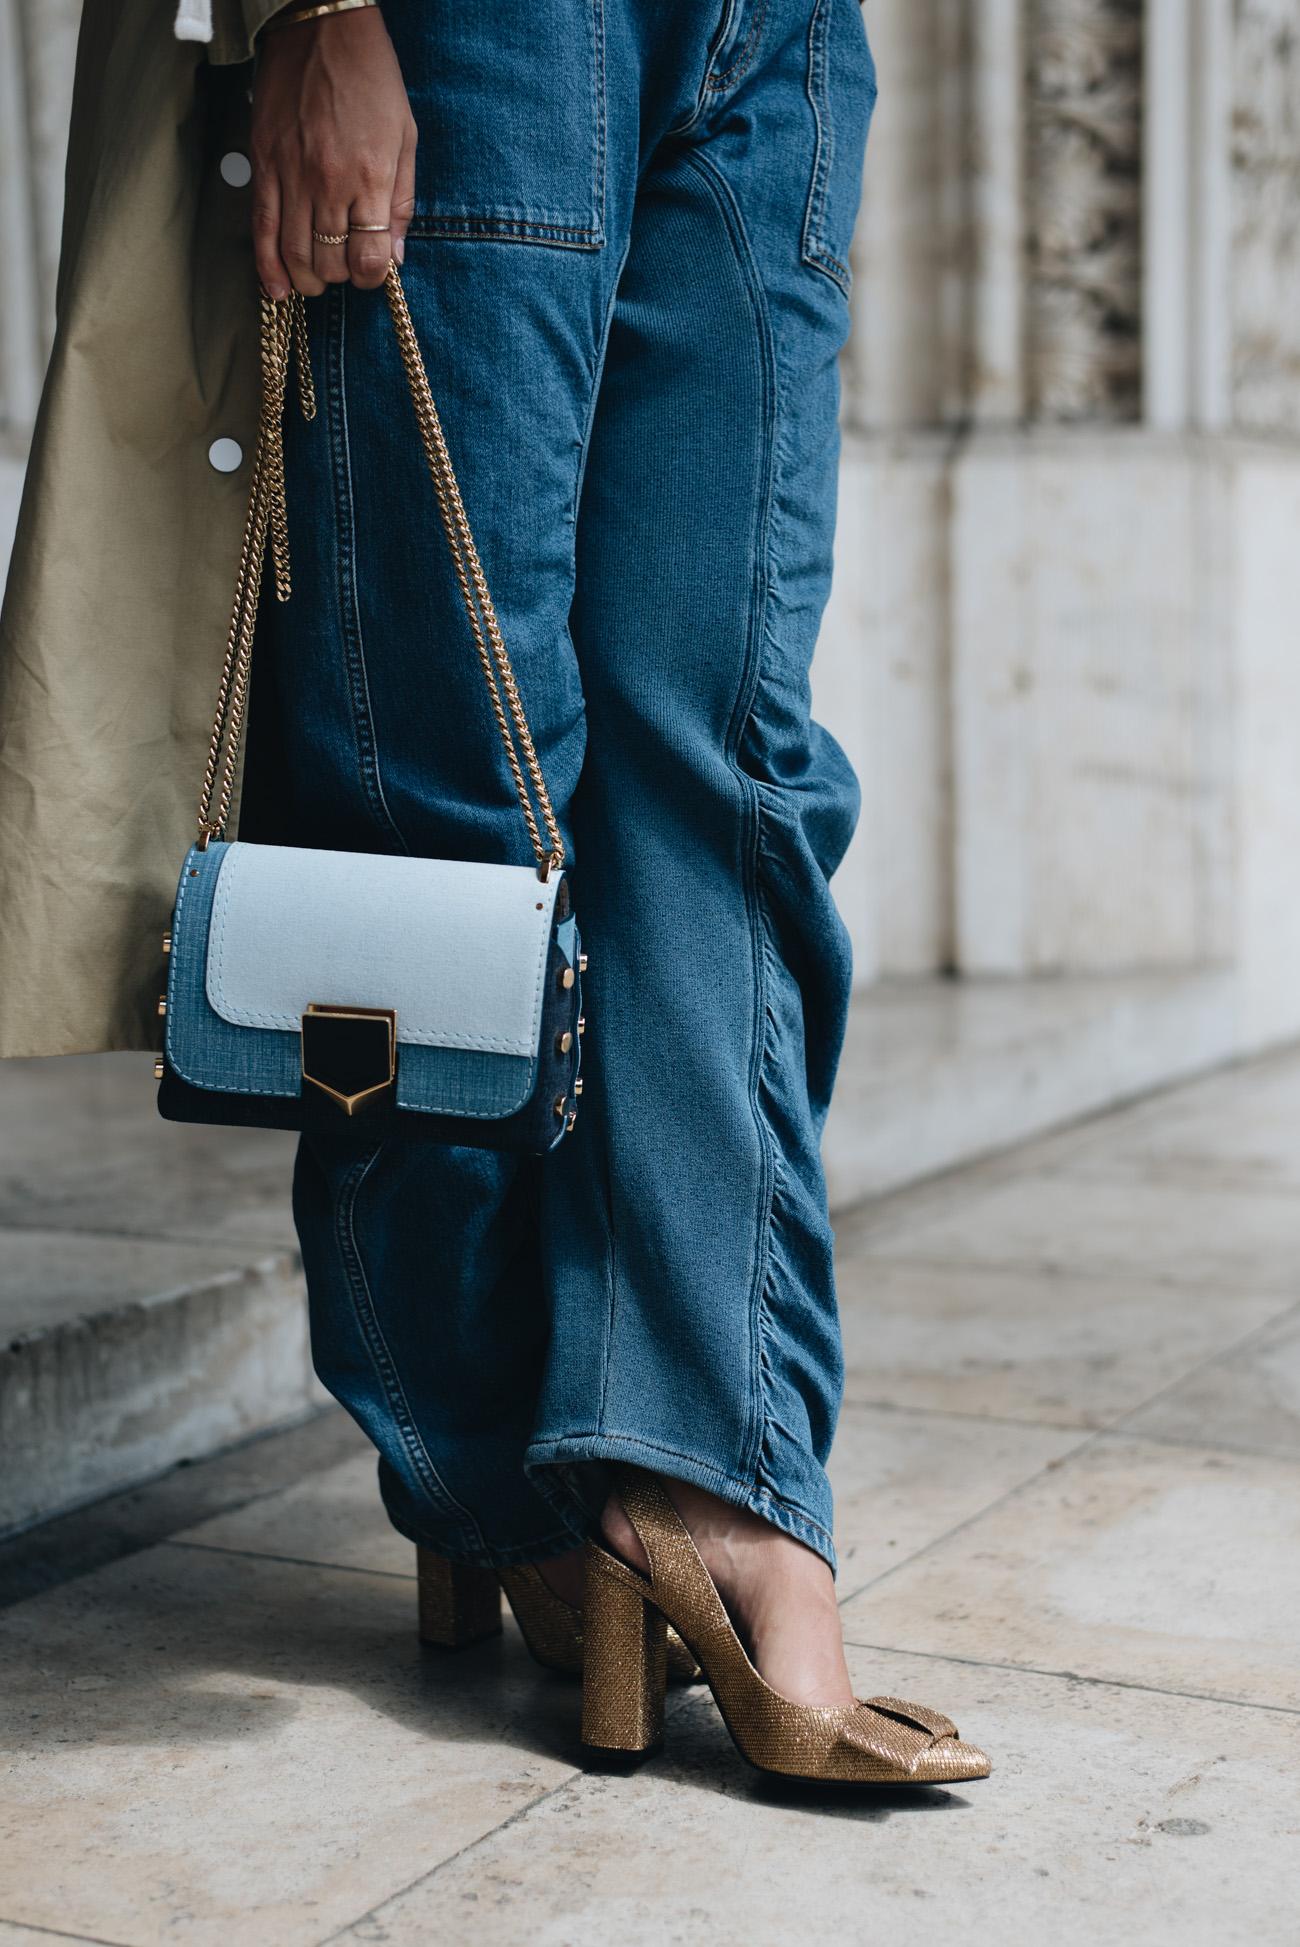 Jeans-Xenia-mit-Raffungen-Stella-McCartney-baggy-pants-denim-fashiioncarpet-nina-schwichtenberg